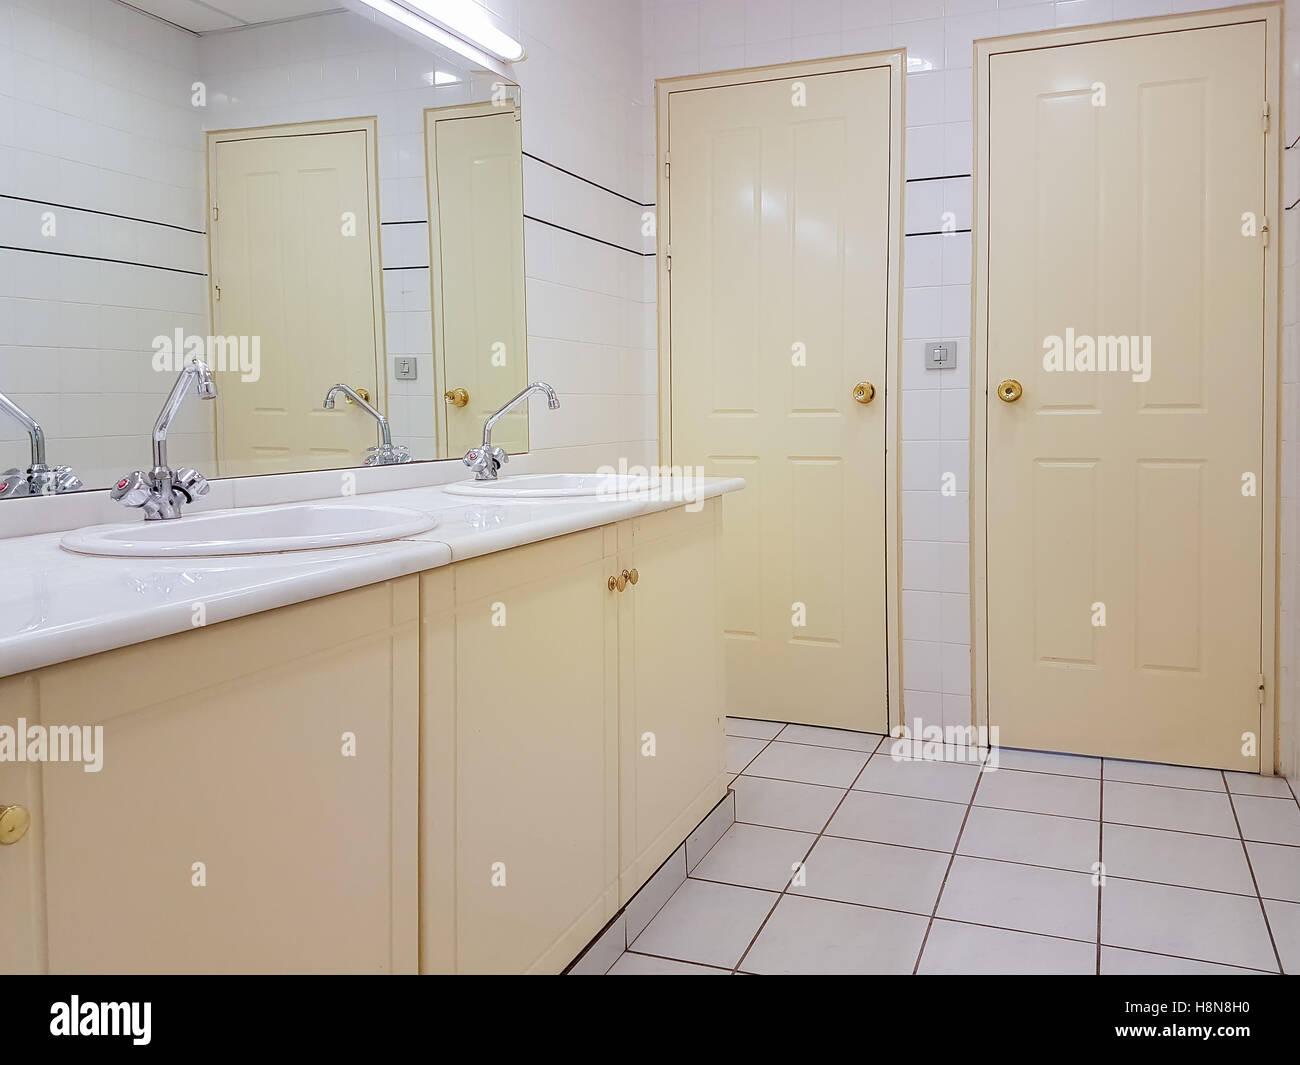 Public toilet design with beige colour Stock Photo: 125857564 - Alamy